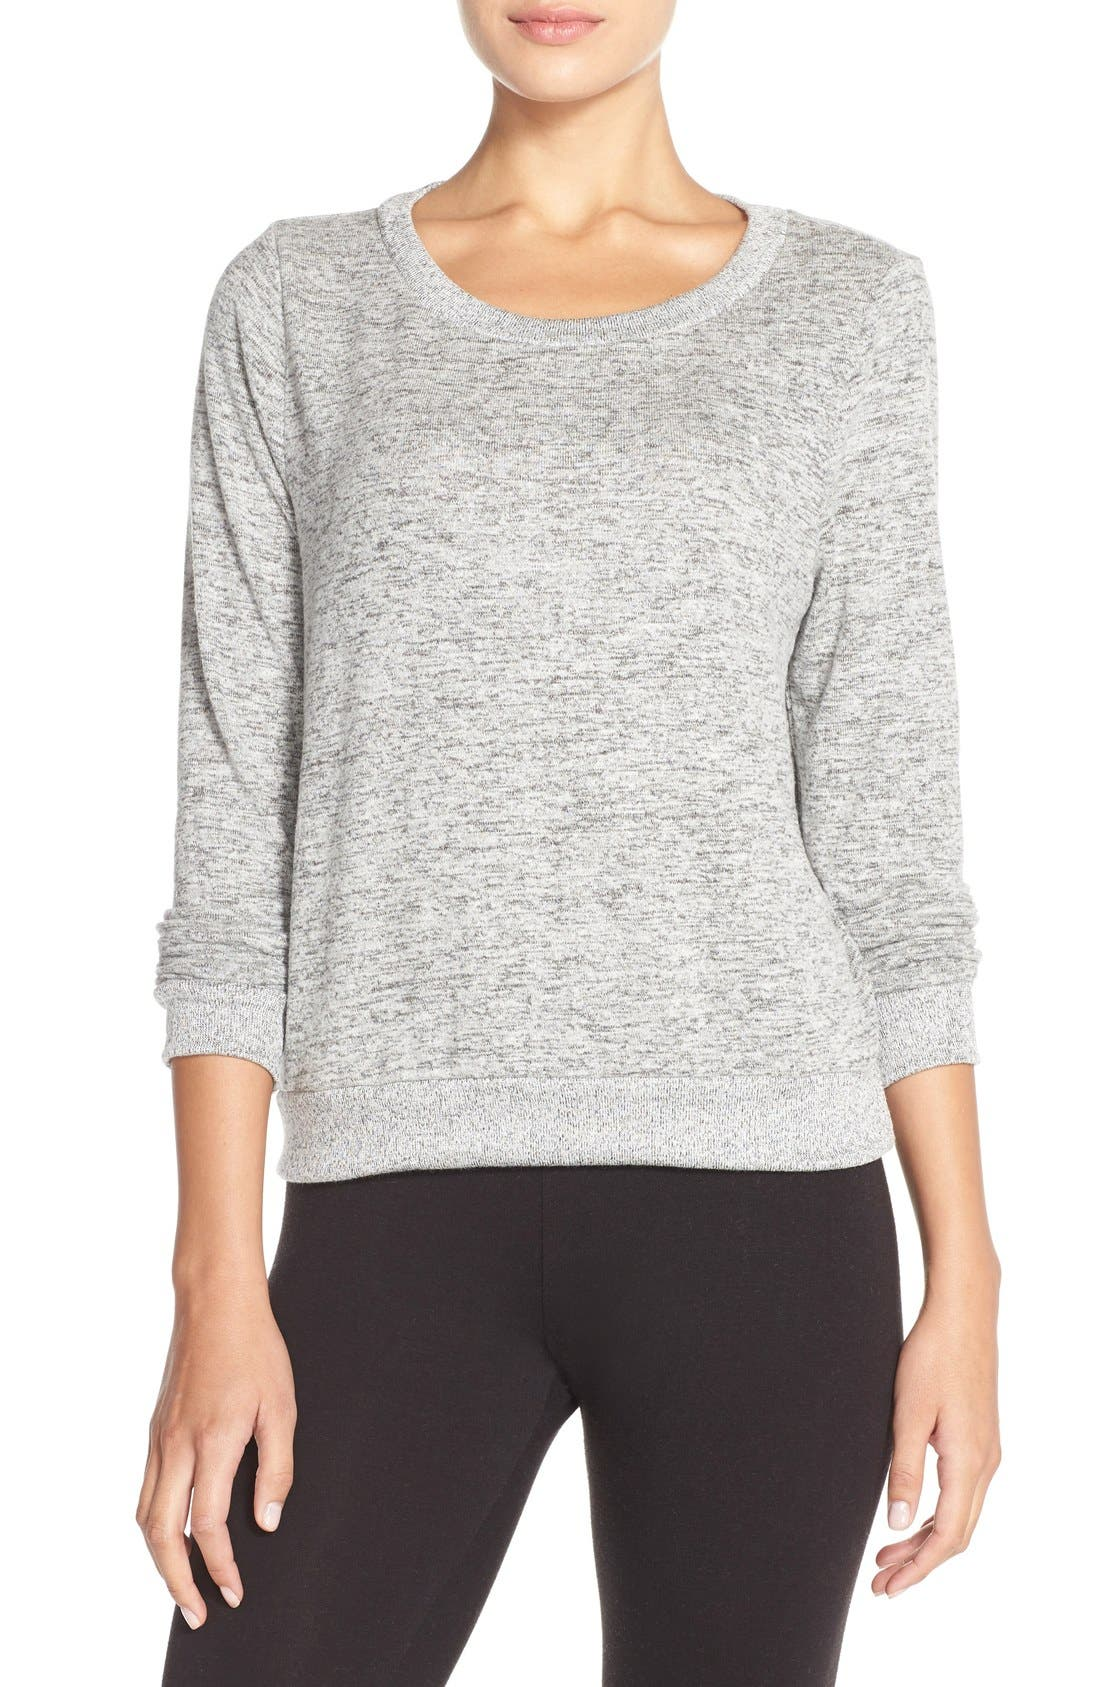 Brushed Hacci Sweatshirt,                         Main,                         color, Grey Flannel Marl